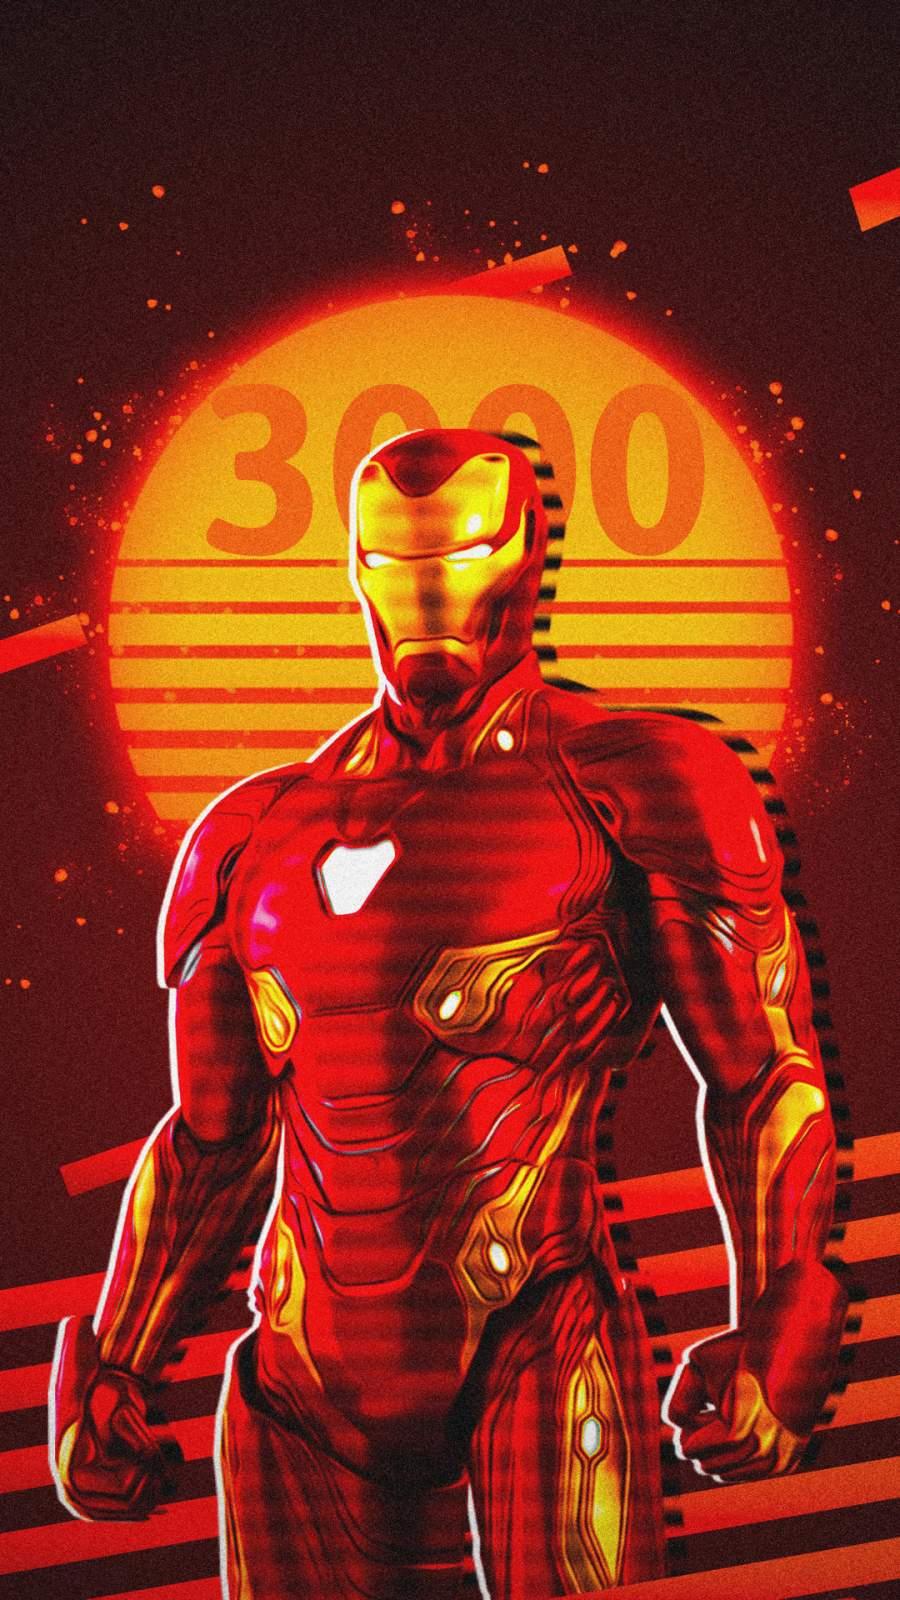 Iron Man Love You 3000 iPhone Wallpaper